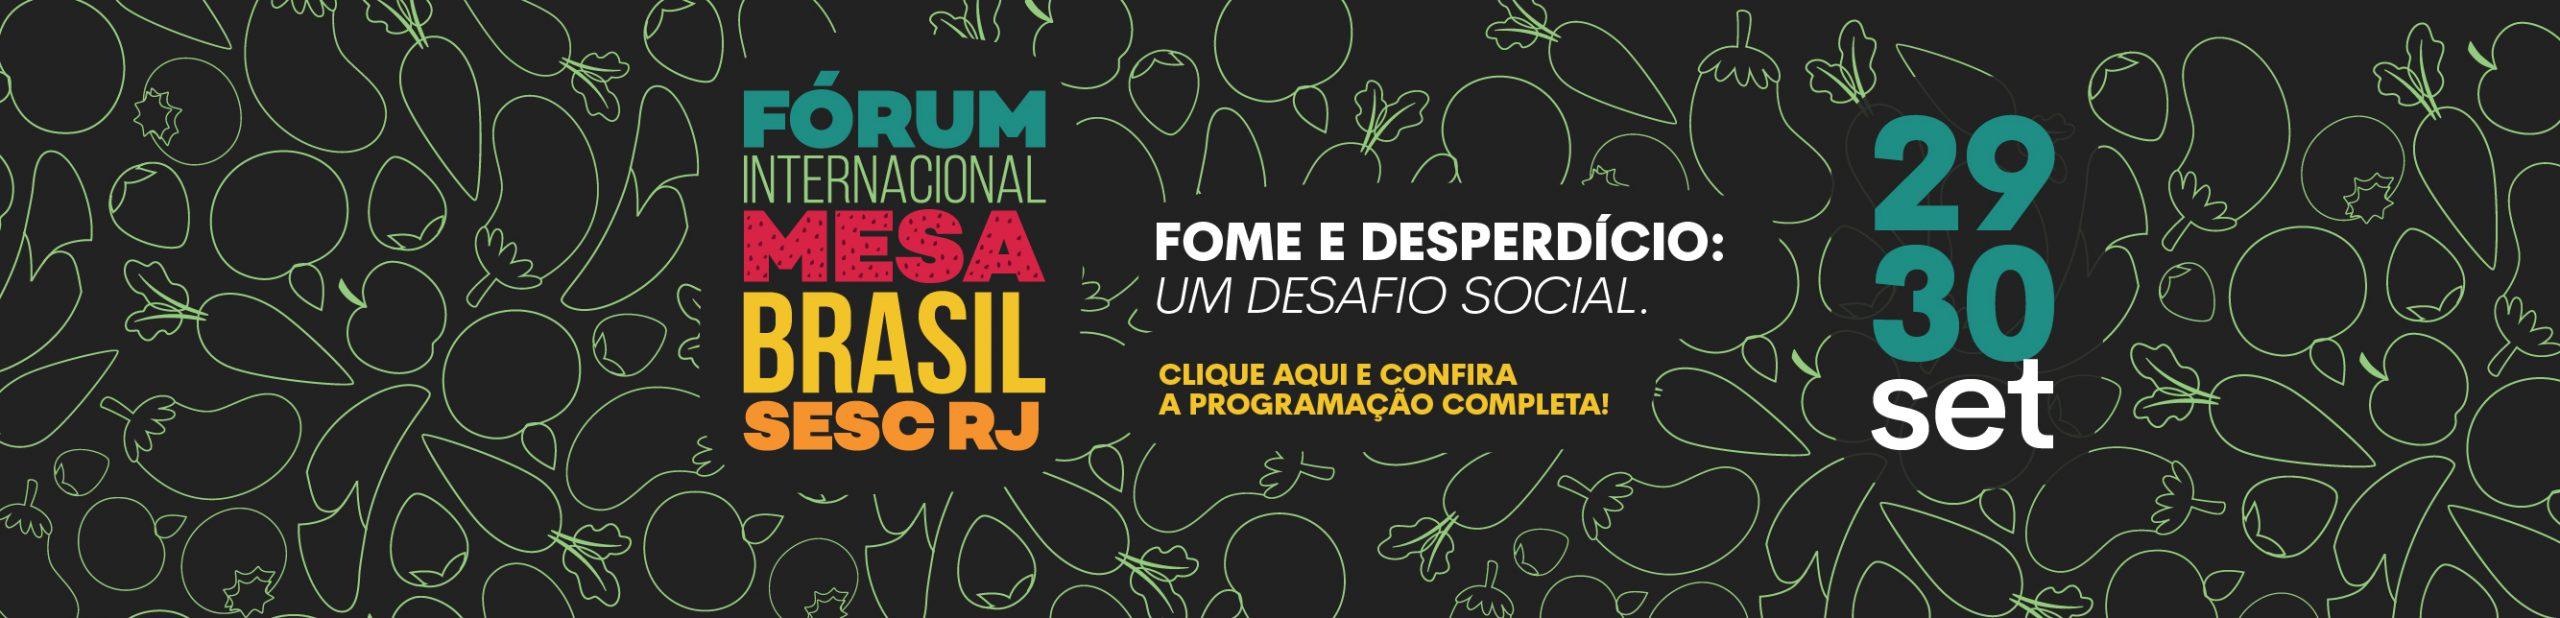 Fórum Internacional do Mesa Brasil